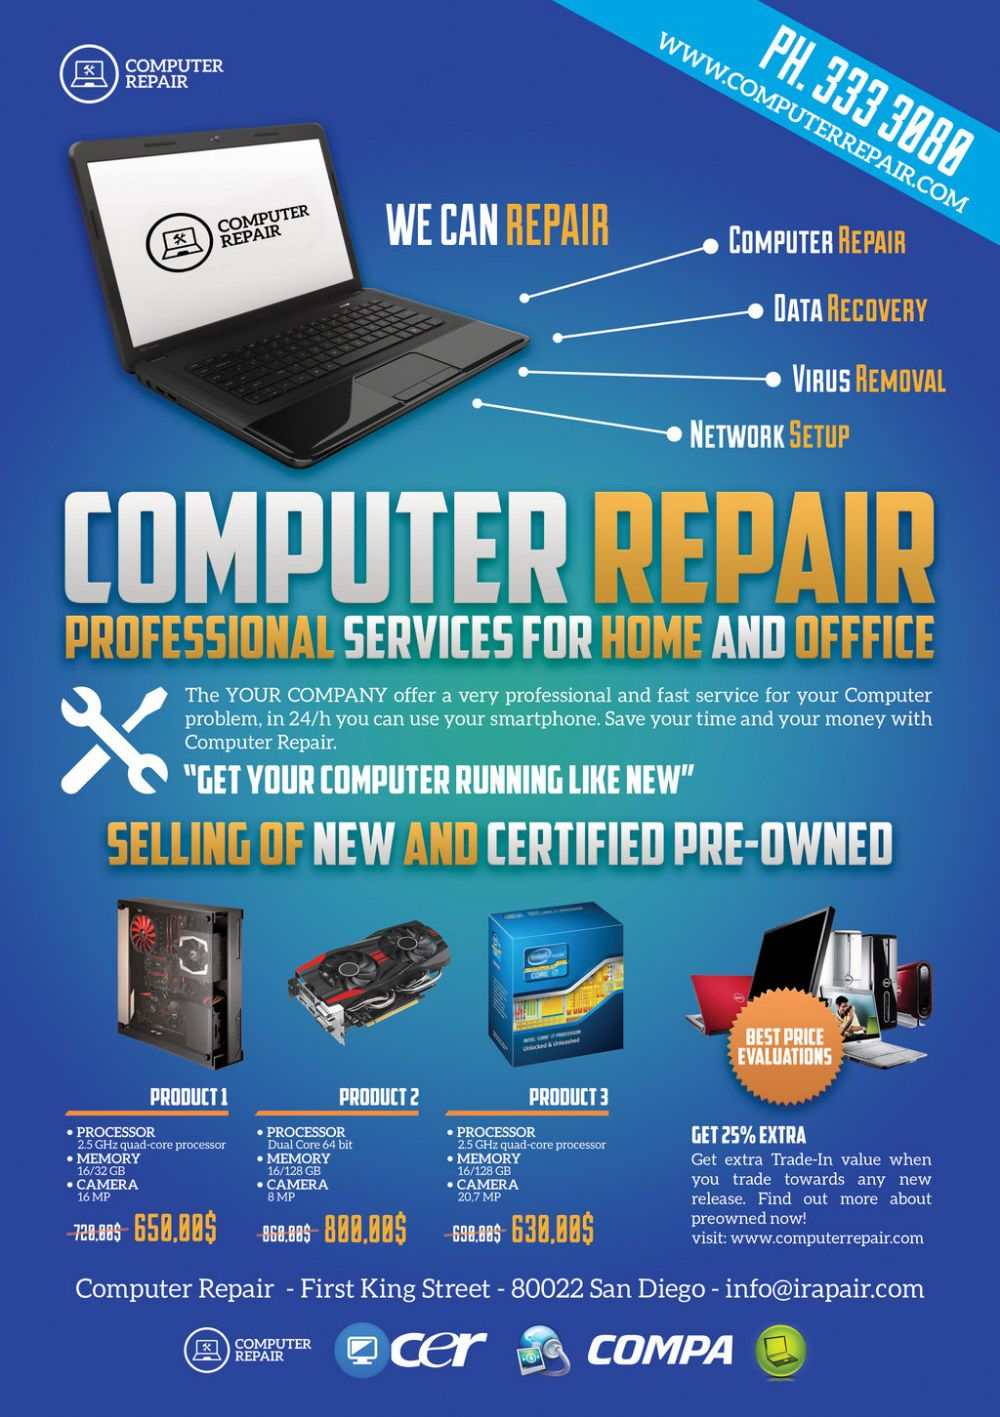 003 Unusual Computer Repair Flyer Template Highest Quality  Word Busines FreeFull